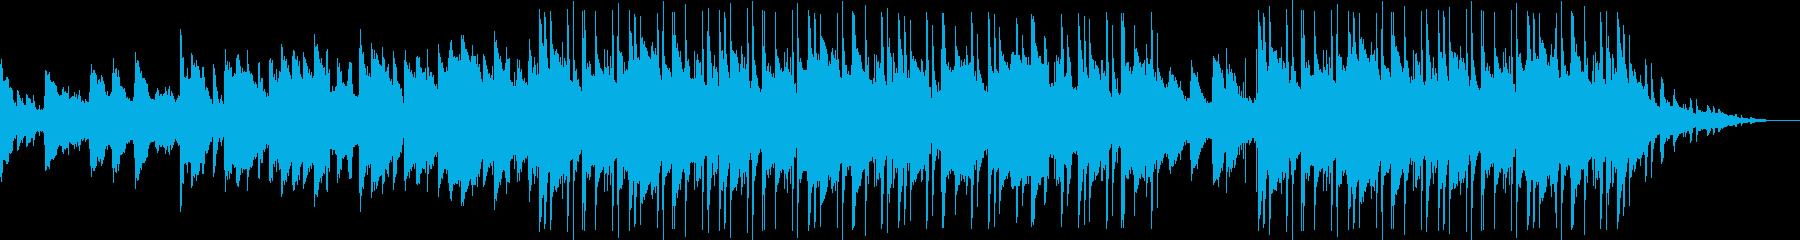 jazz lo-fi hip-hop2の再生済みの波形